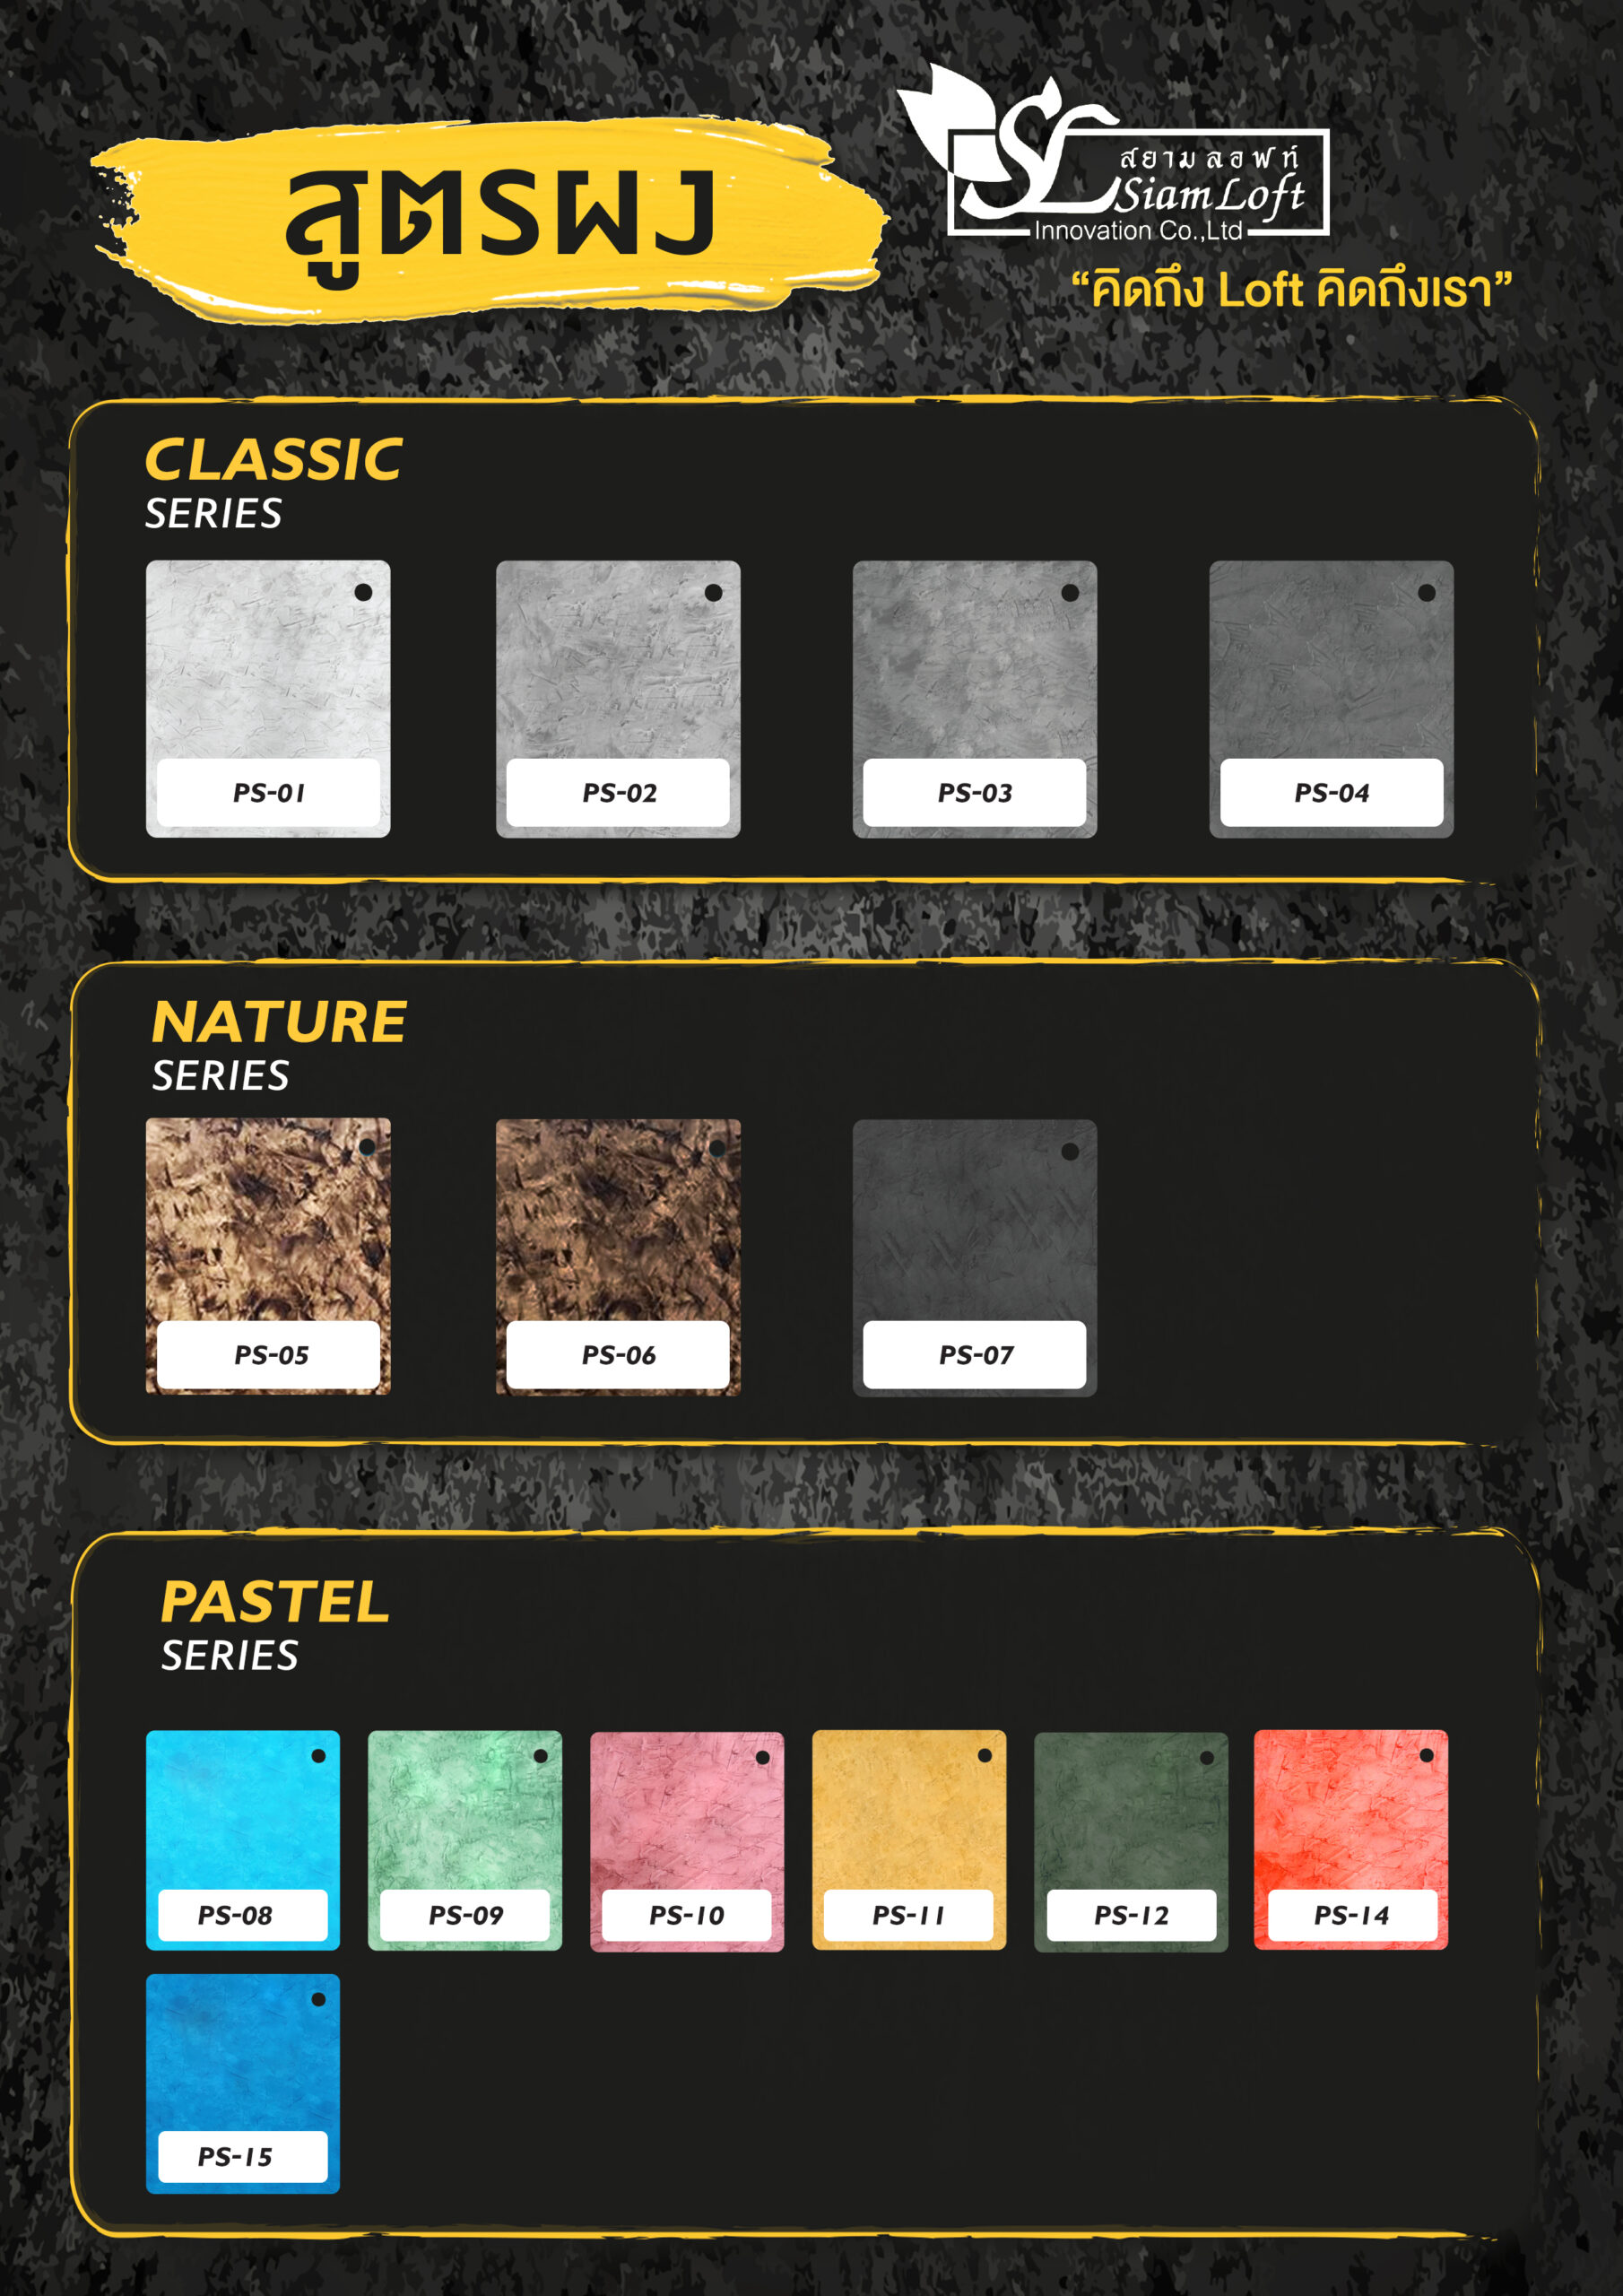 Catalog-สีปูนลอฟท์-สูตรผง-สยามลอฟท์